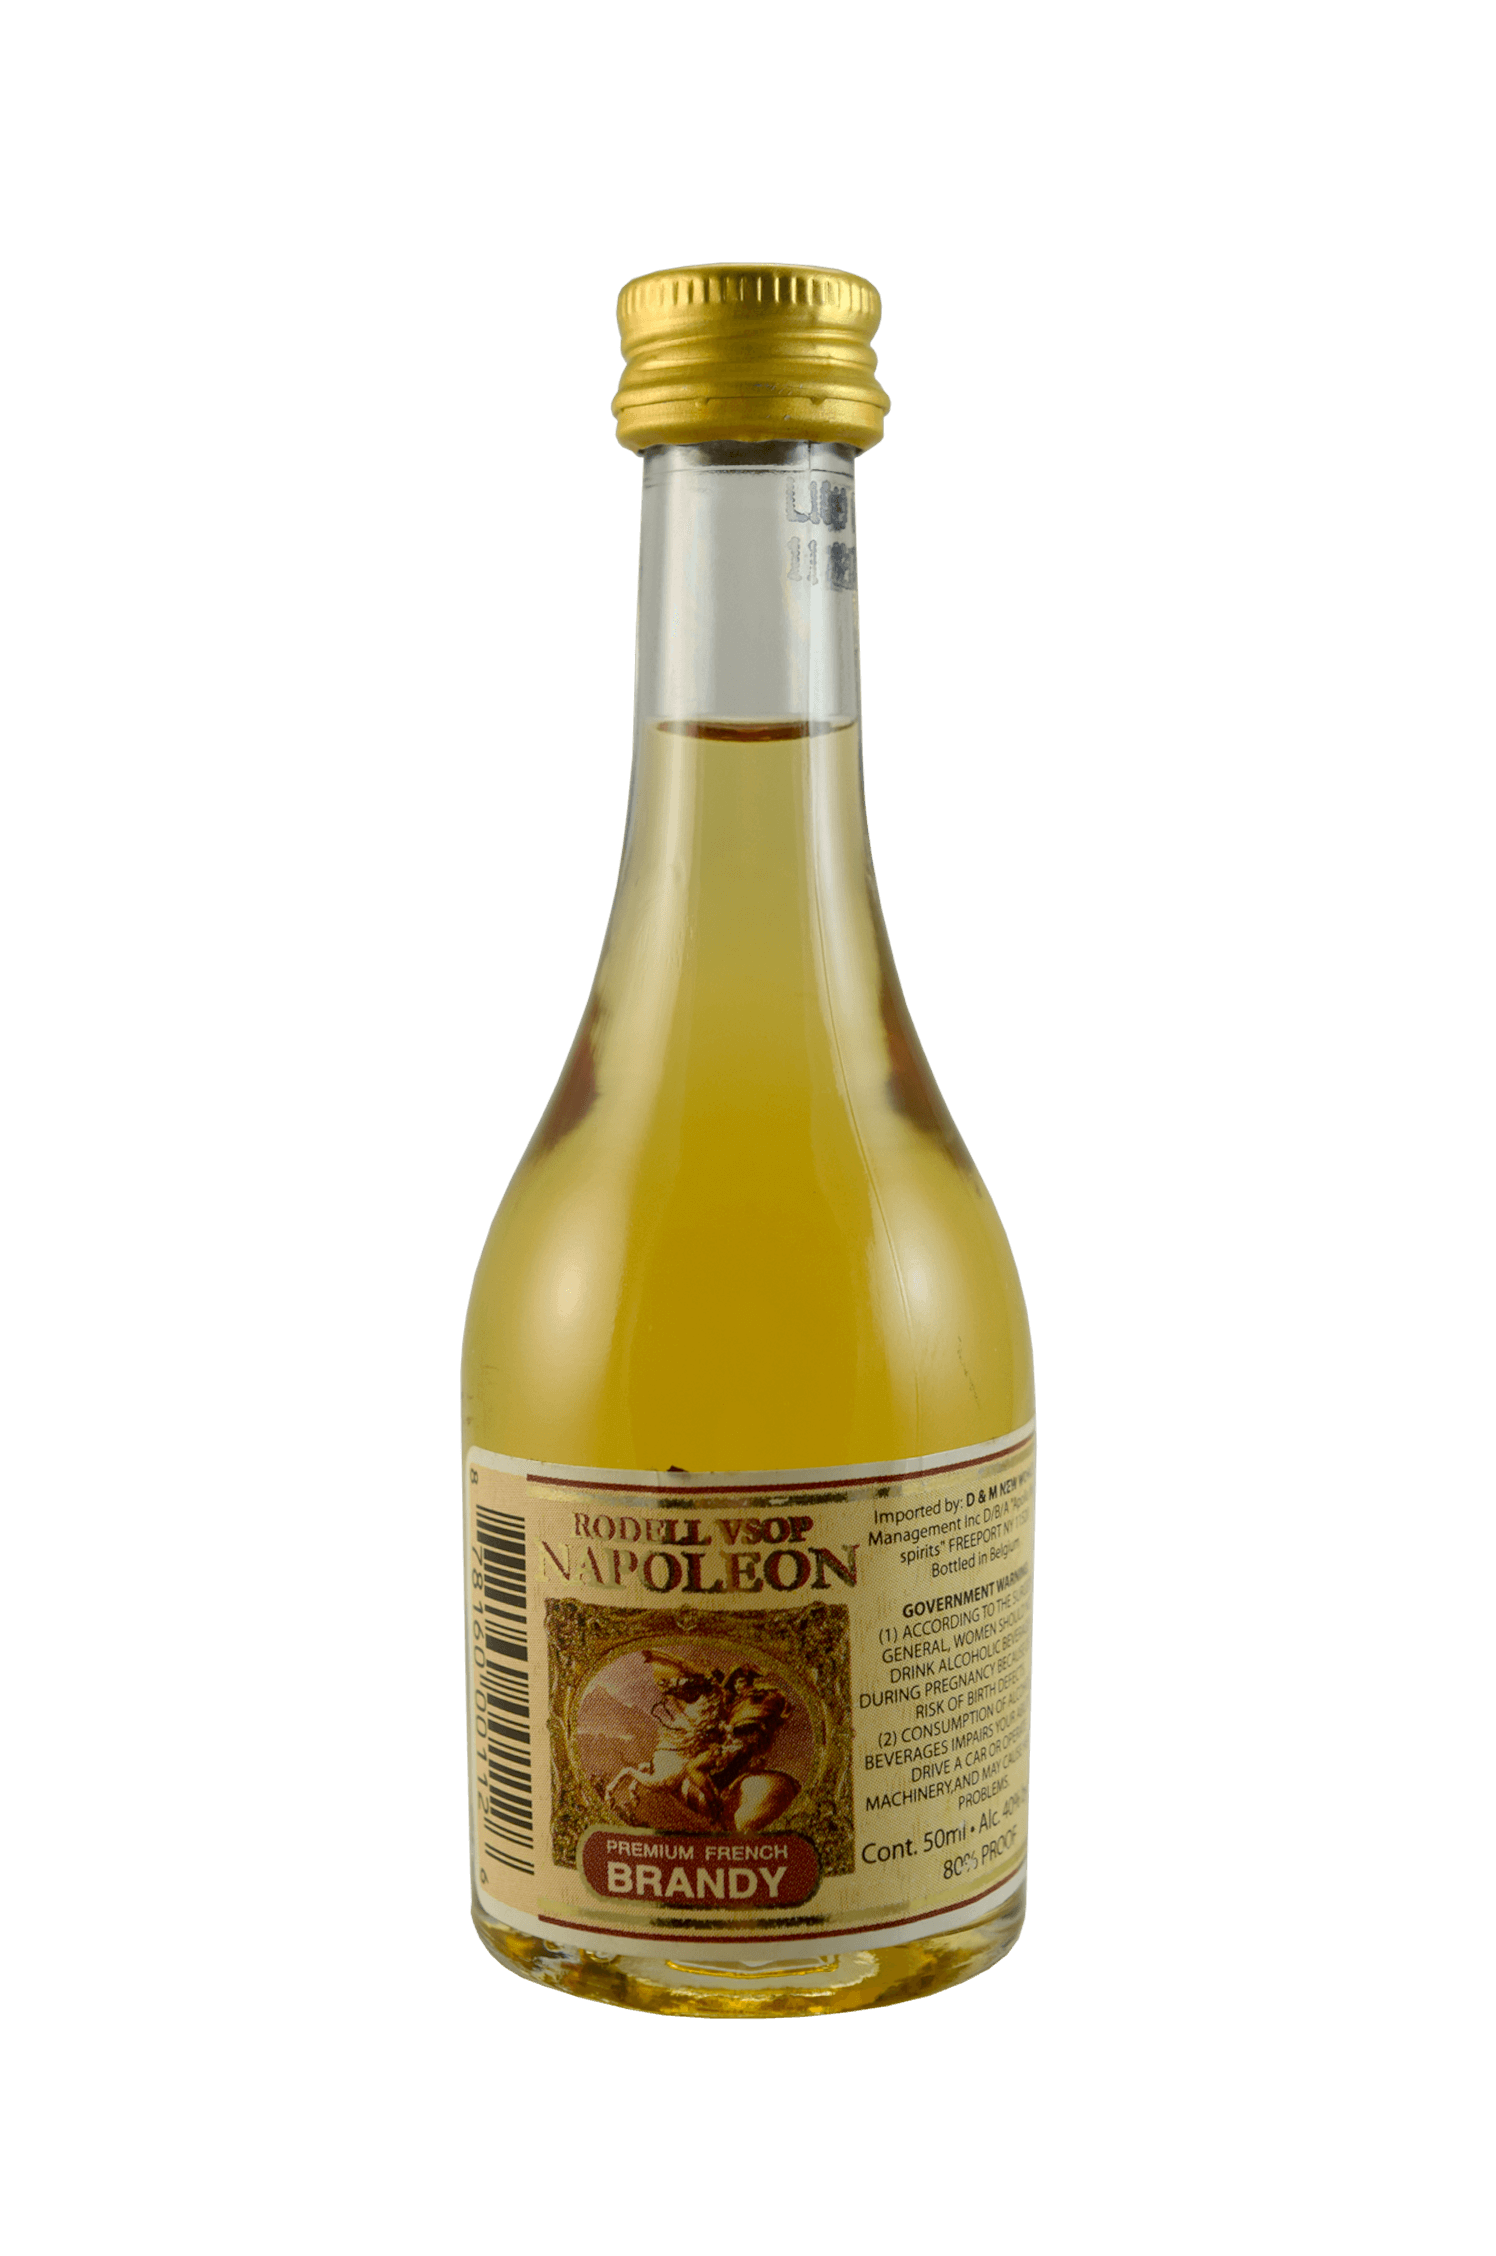 Rodell VSOP Napoleon Brandy